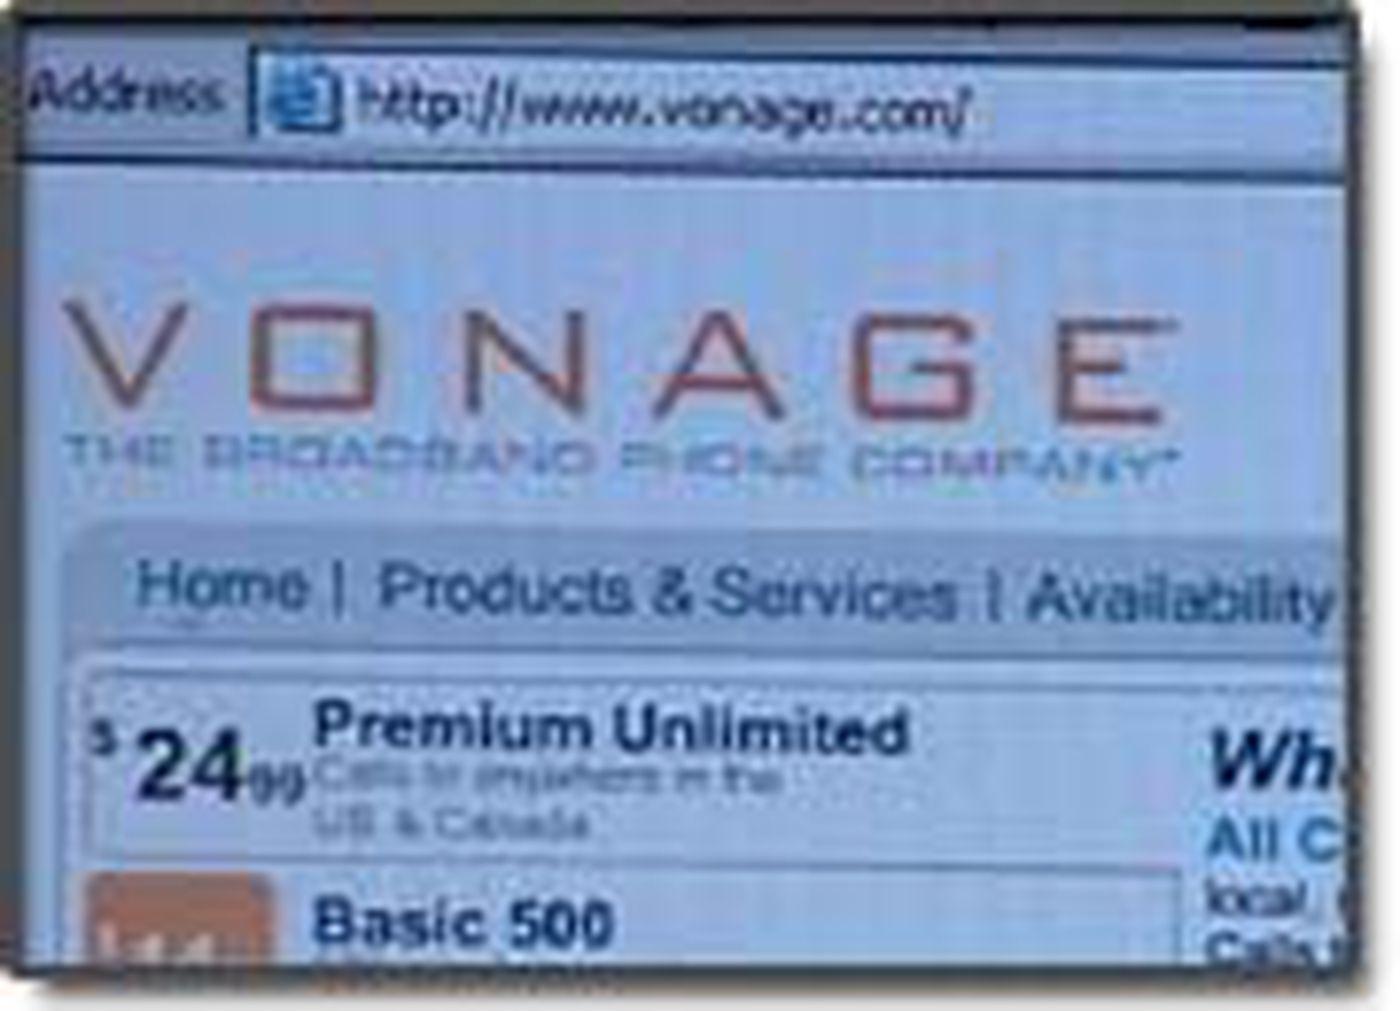 9 1 1 Concerns Prompt New Vonage Internet Phone System Test